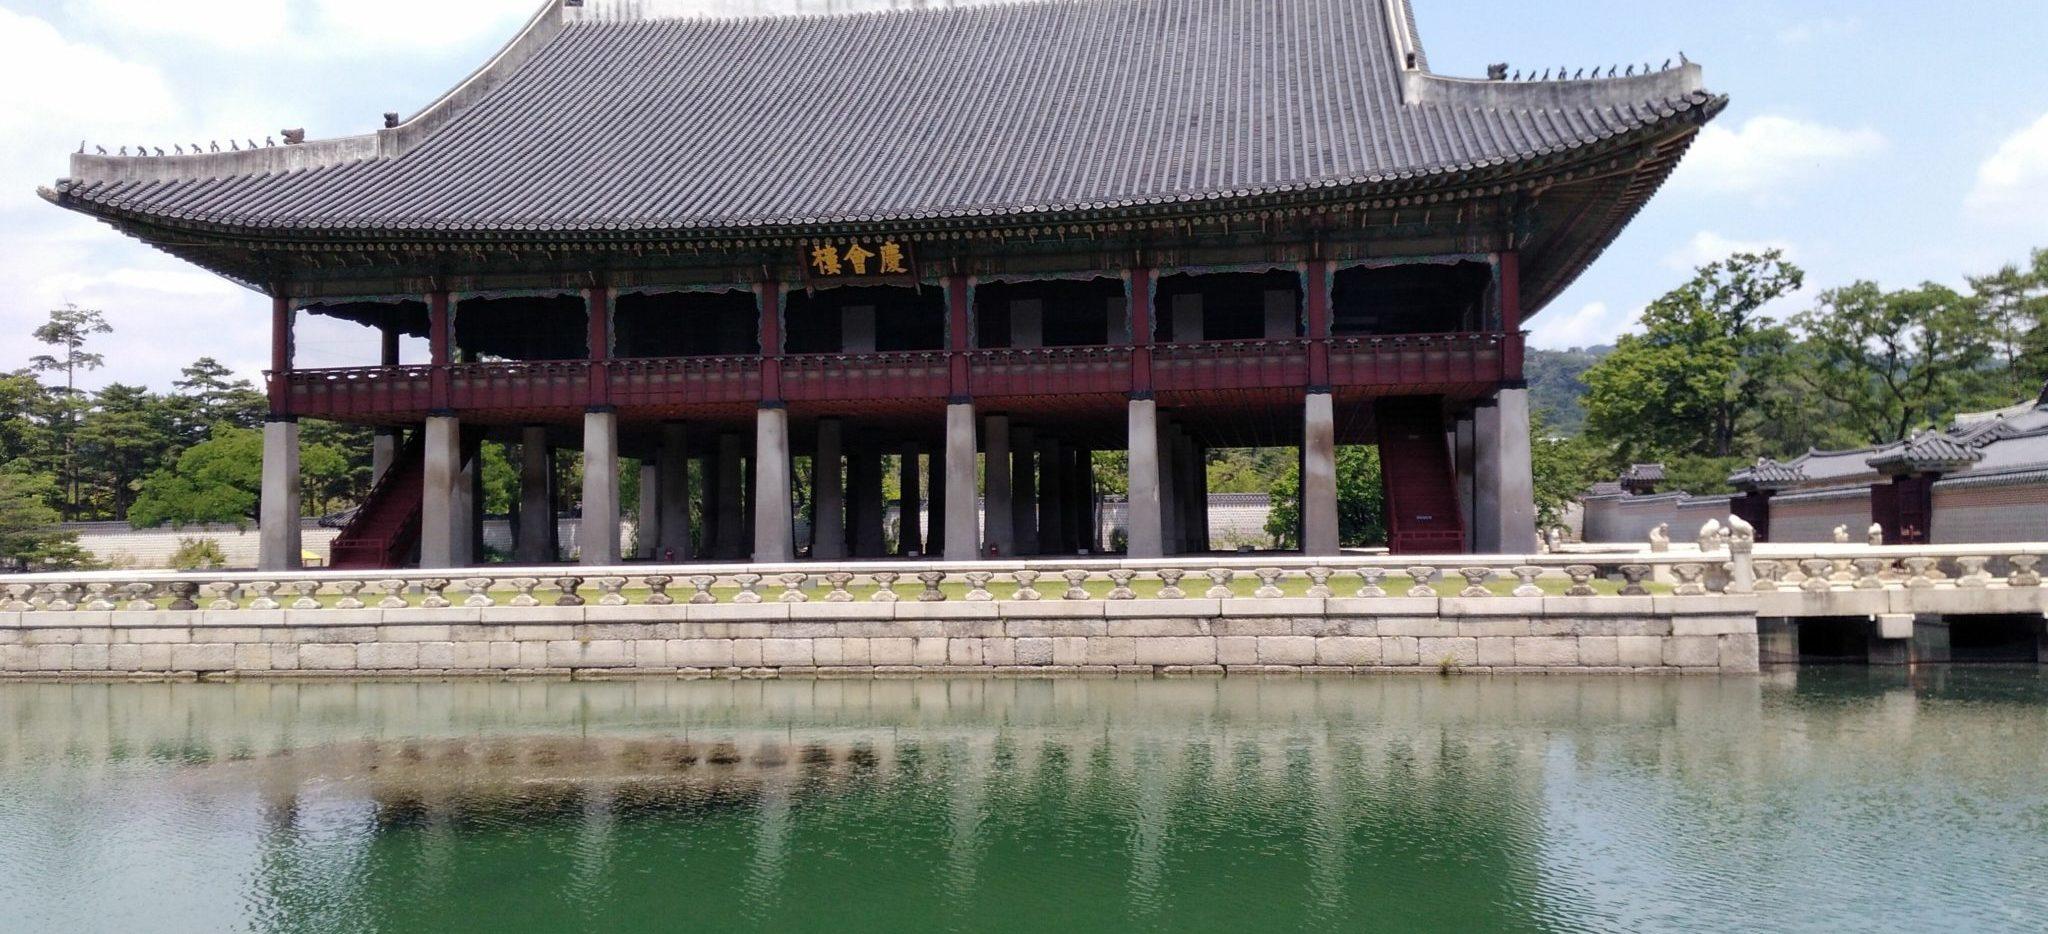 Gyeongbokgung (경복궁) – Un palais historique